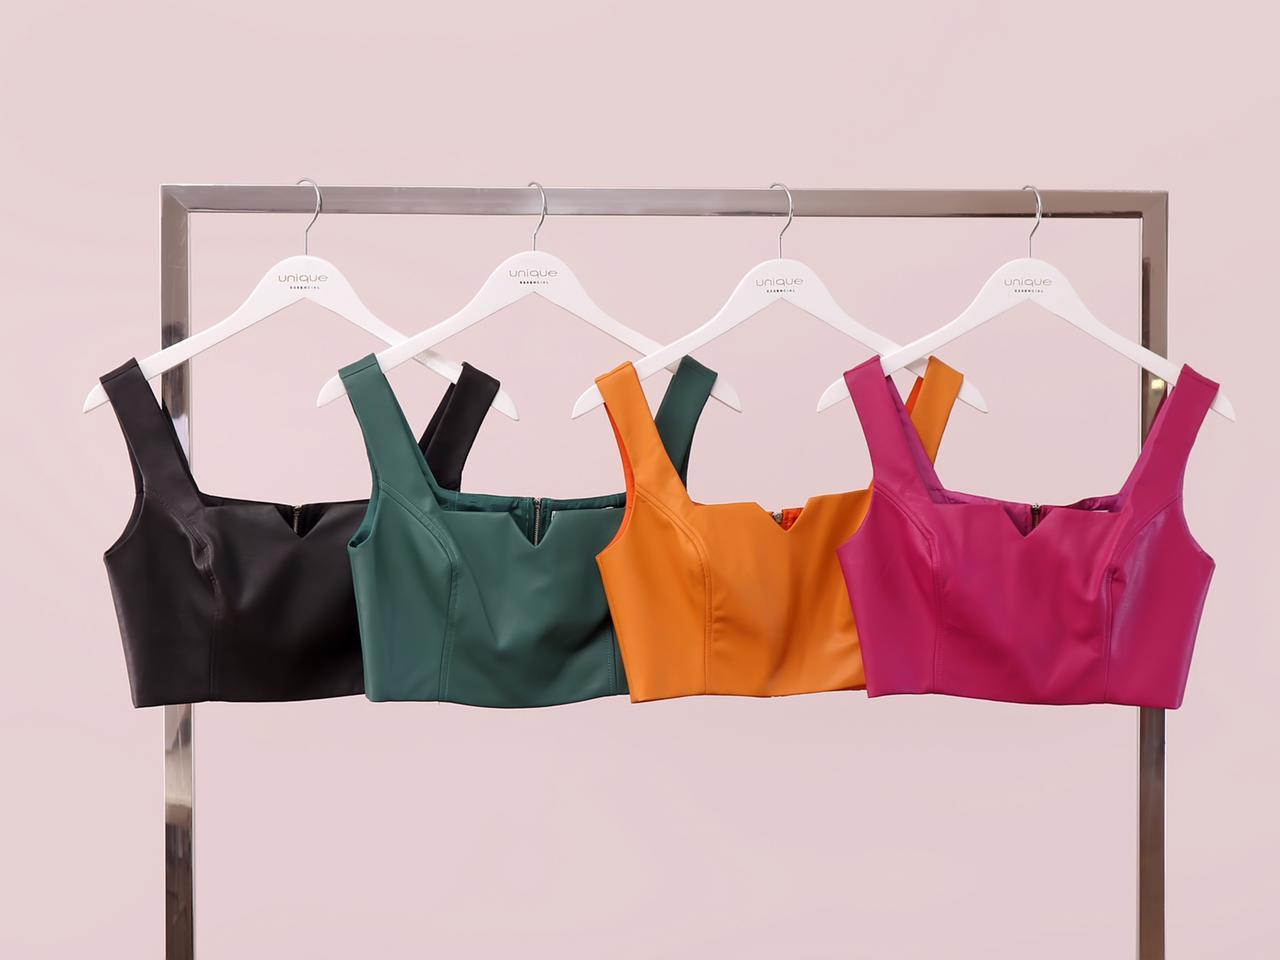 Blusa Lilian Cropped Couro Eco (Forro) Detalhe Decote V Recortes